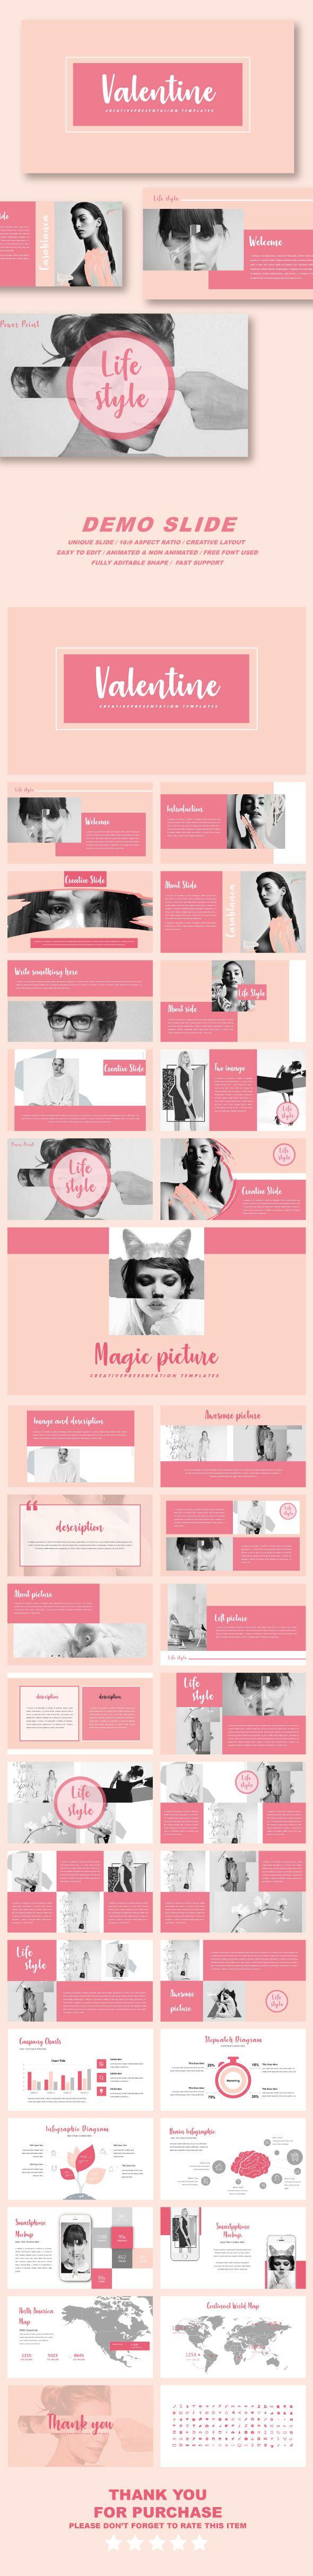 Valentine Multipurpose PowerPoint Templates Template Creative - Awesome valentine powerpoint backgrounds ideas